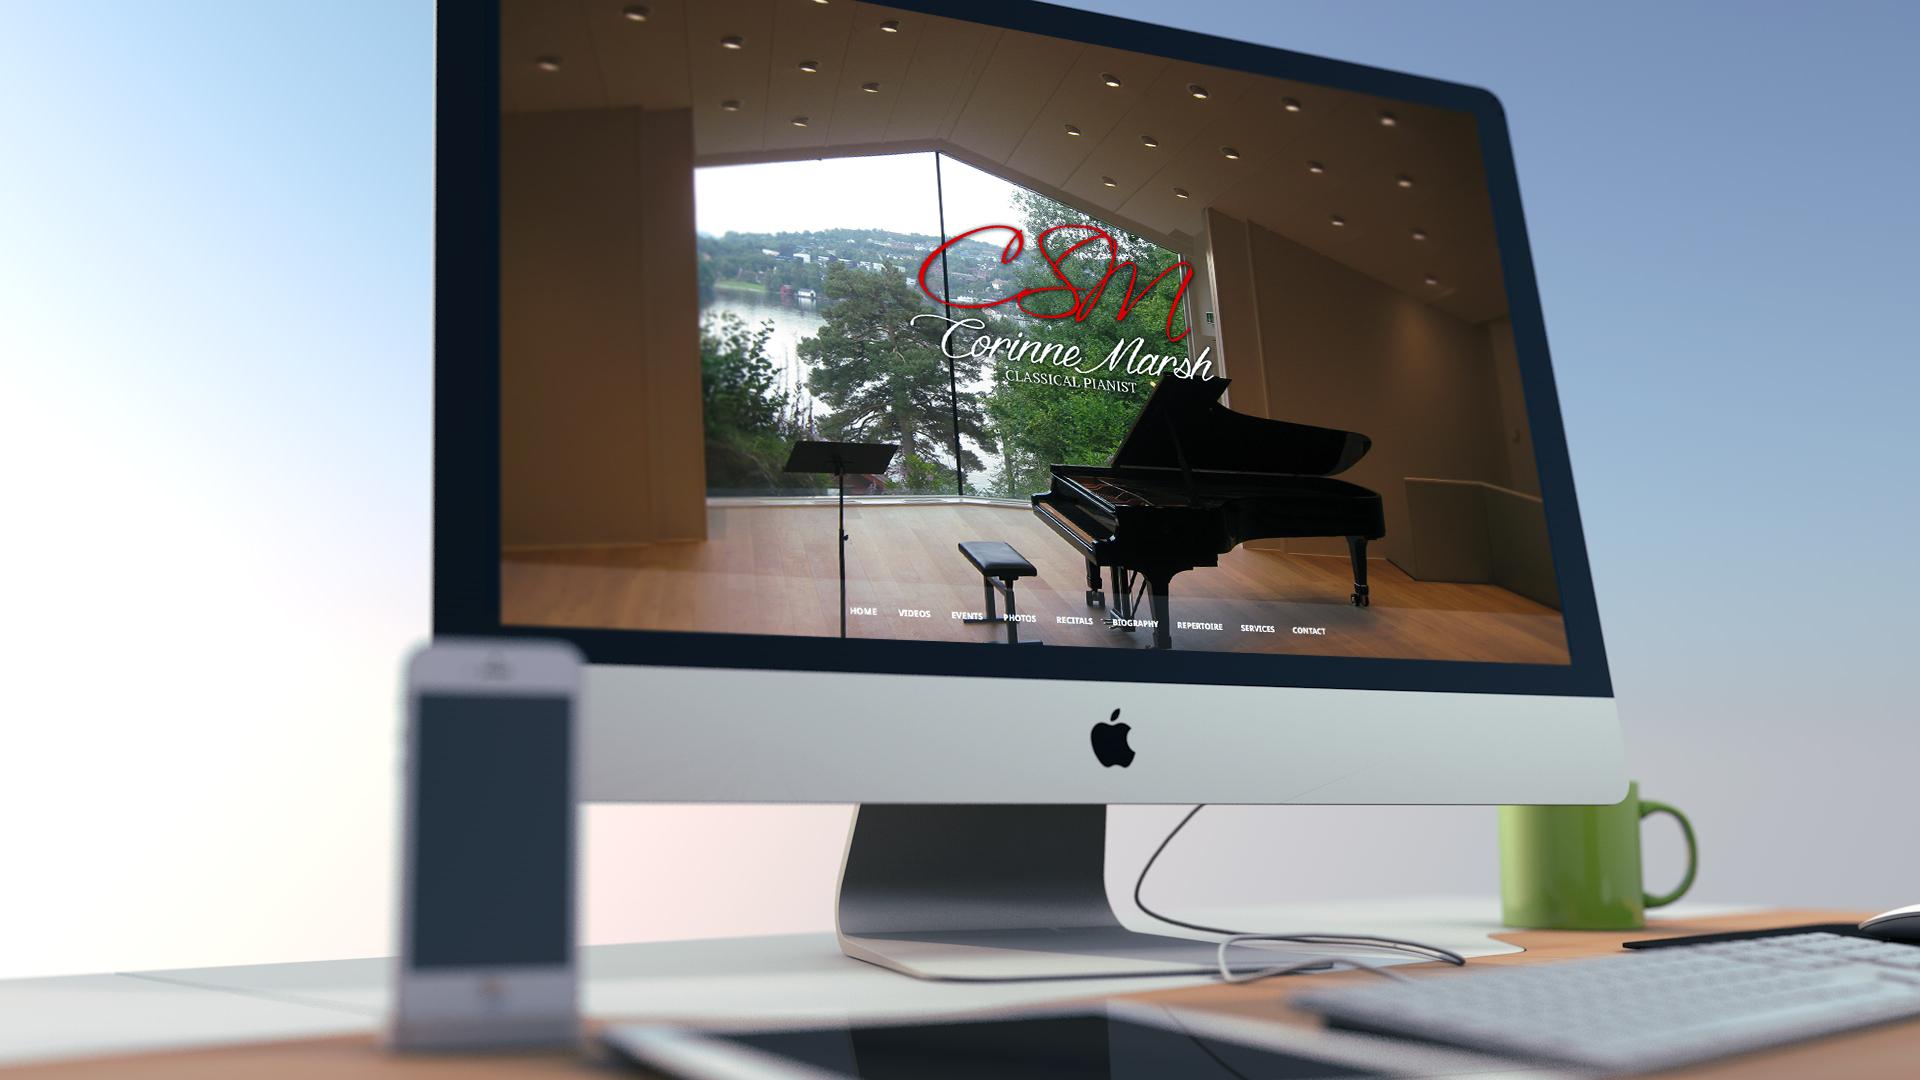 Website for Corinne Marsh Classical Pianist